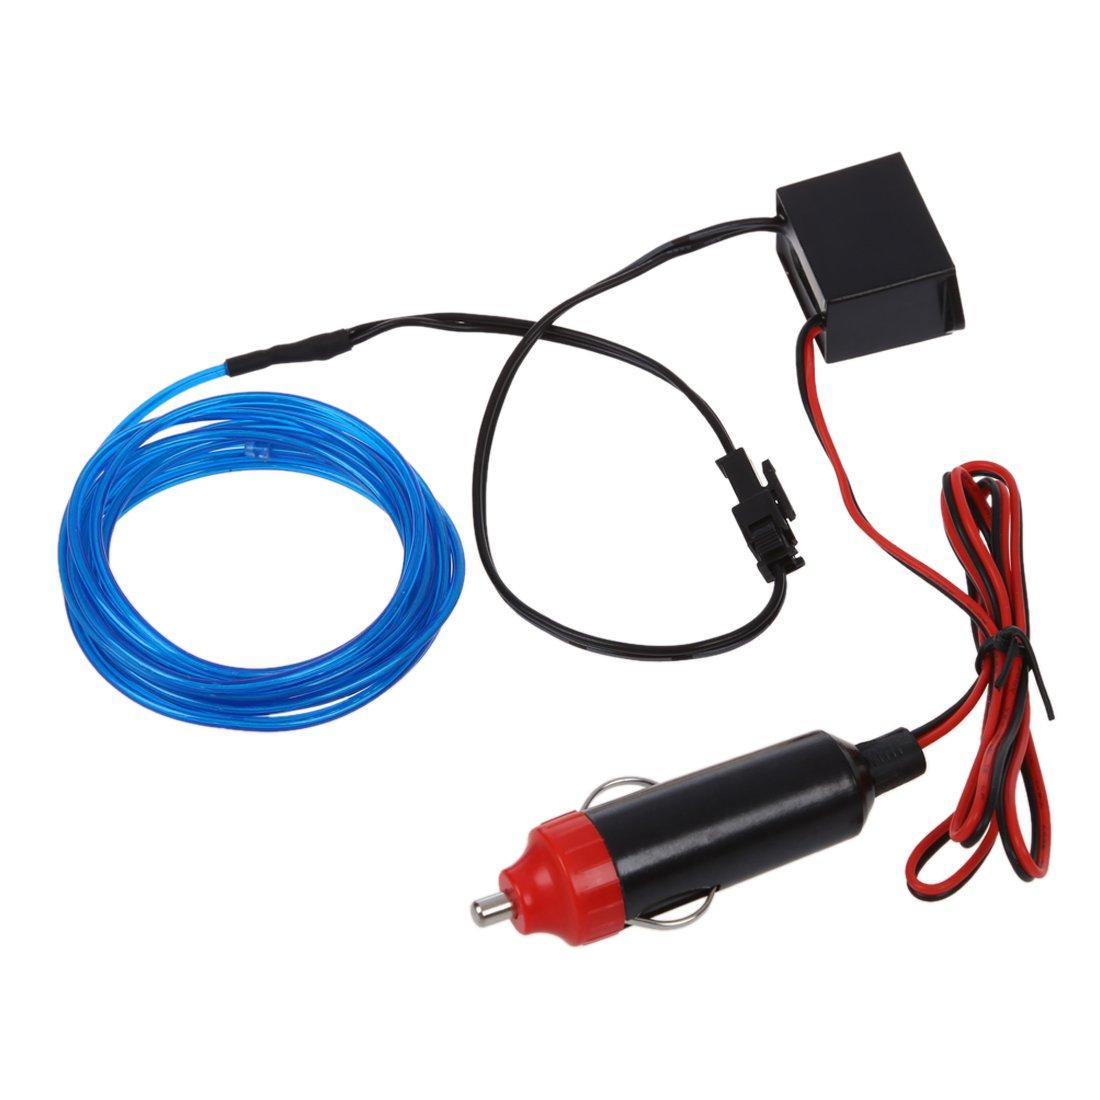 TOOGOO(R) 2M Flexible EL Wire Neon LED Car Light Party Rope Tube + 12V Inverter - Blue SHOMAGT30346